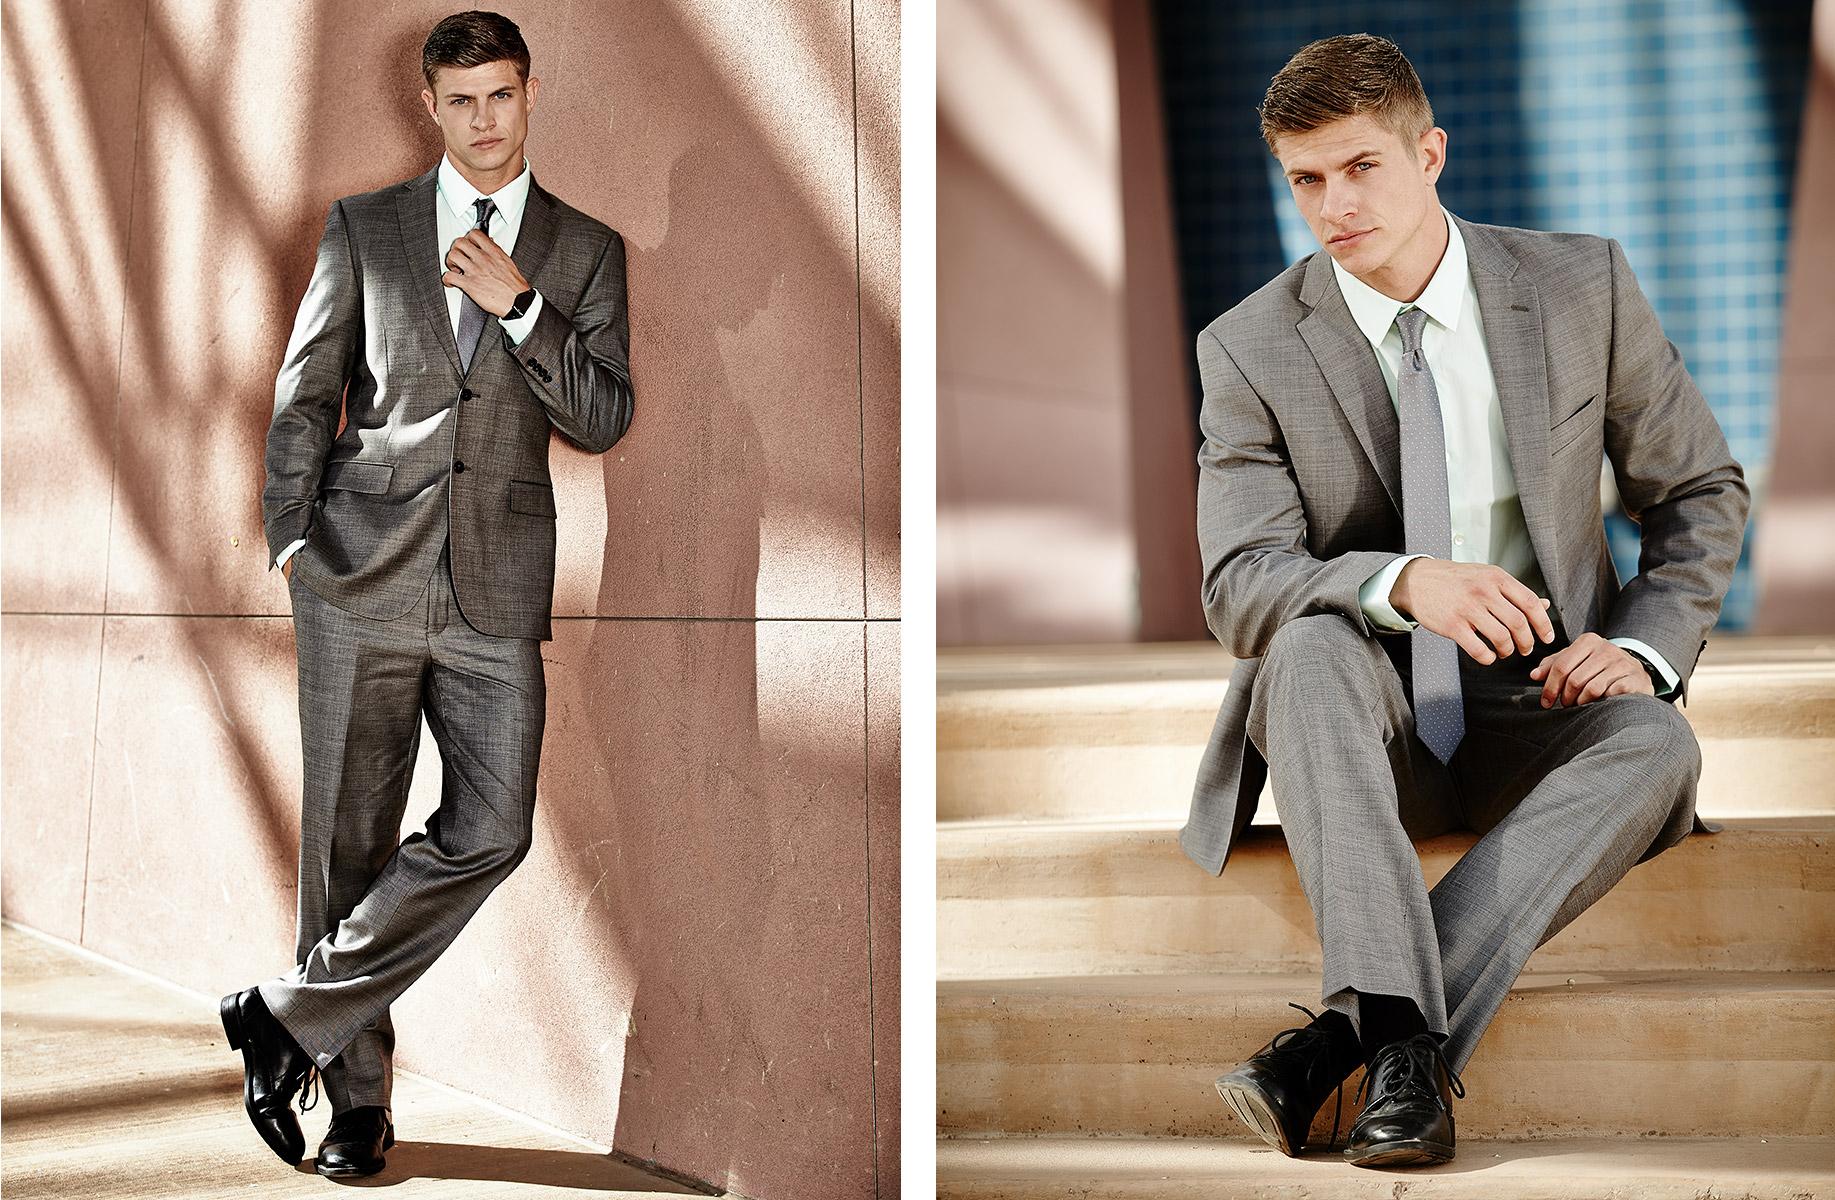 new-mexico-albuquerque-male-models-men-1.jpg